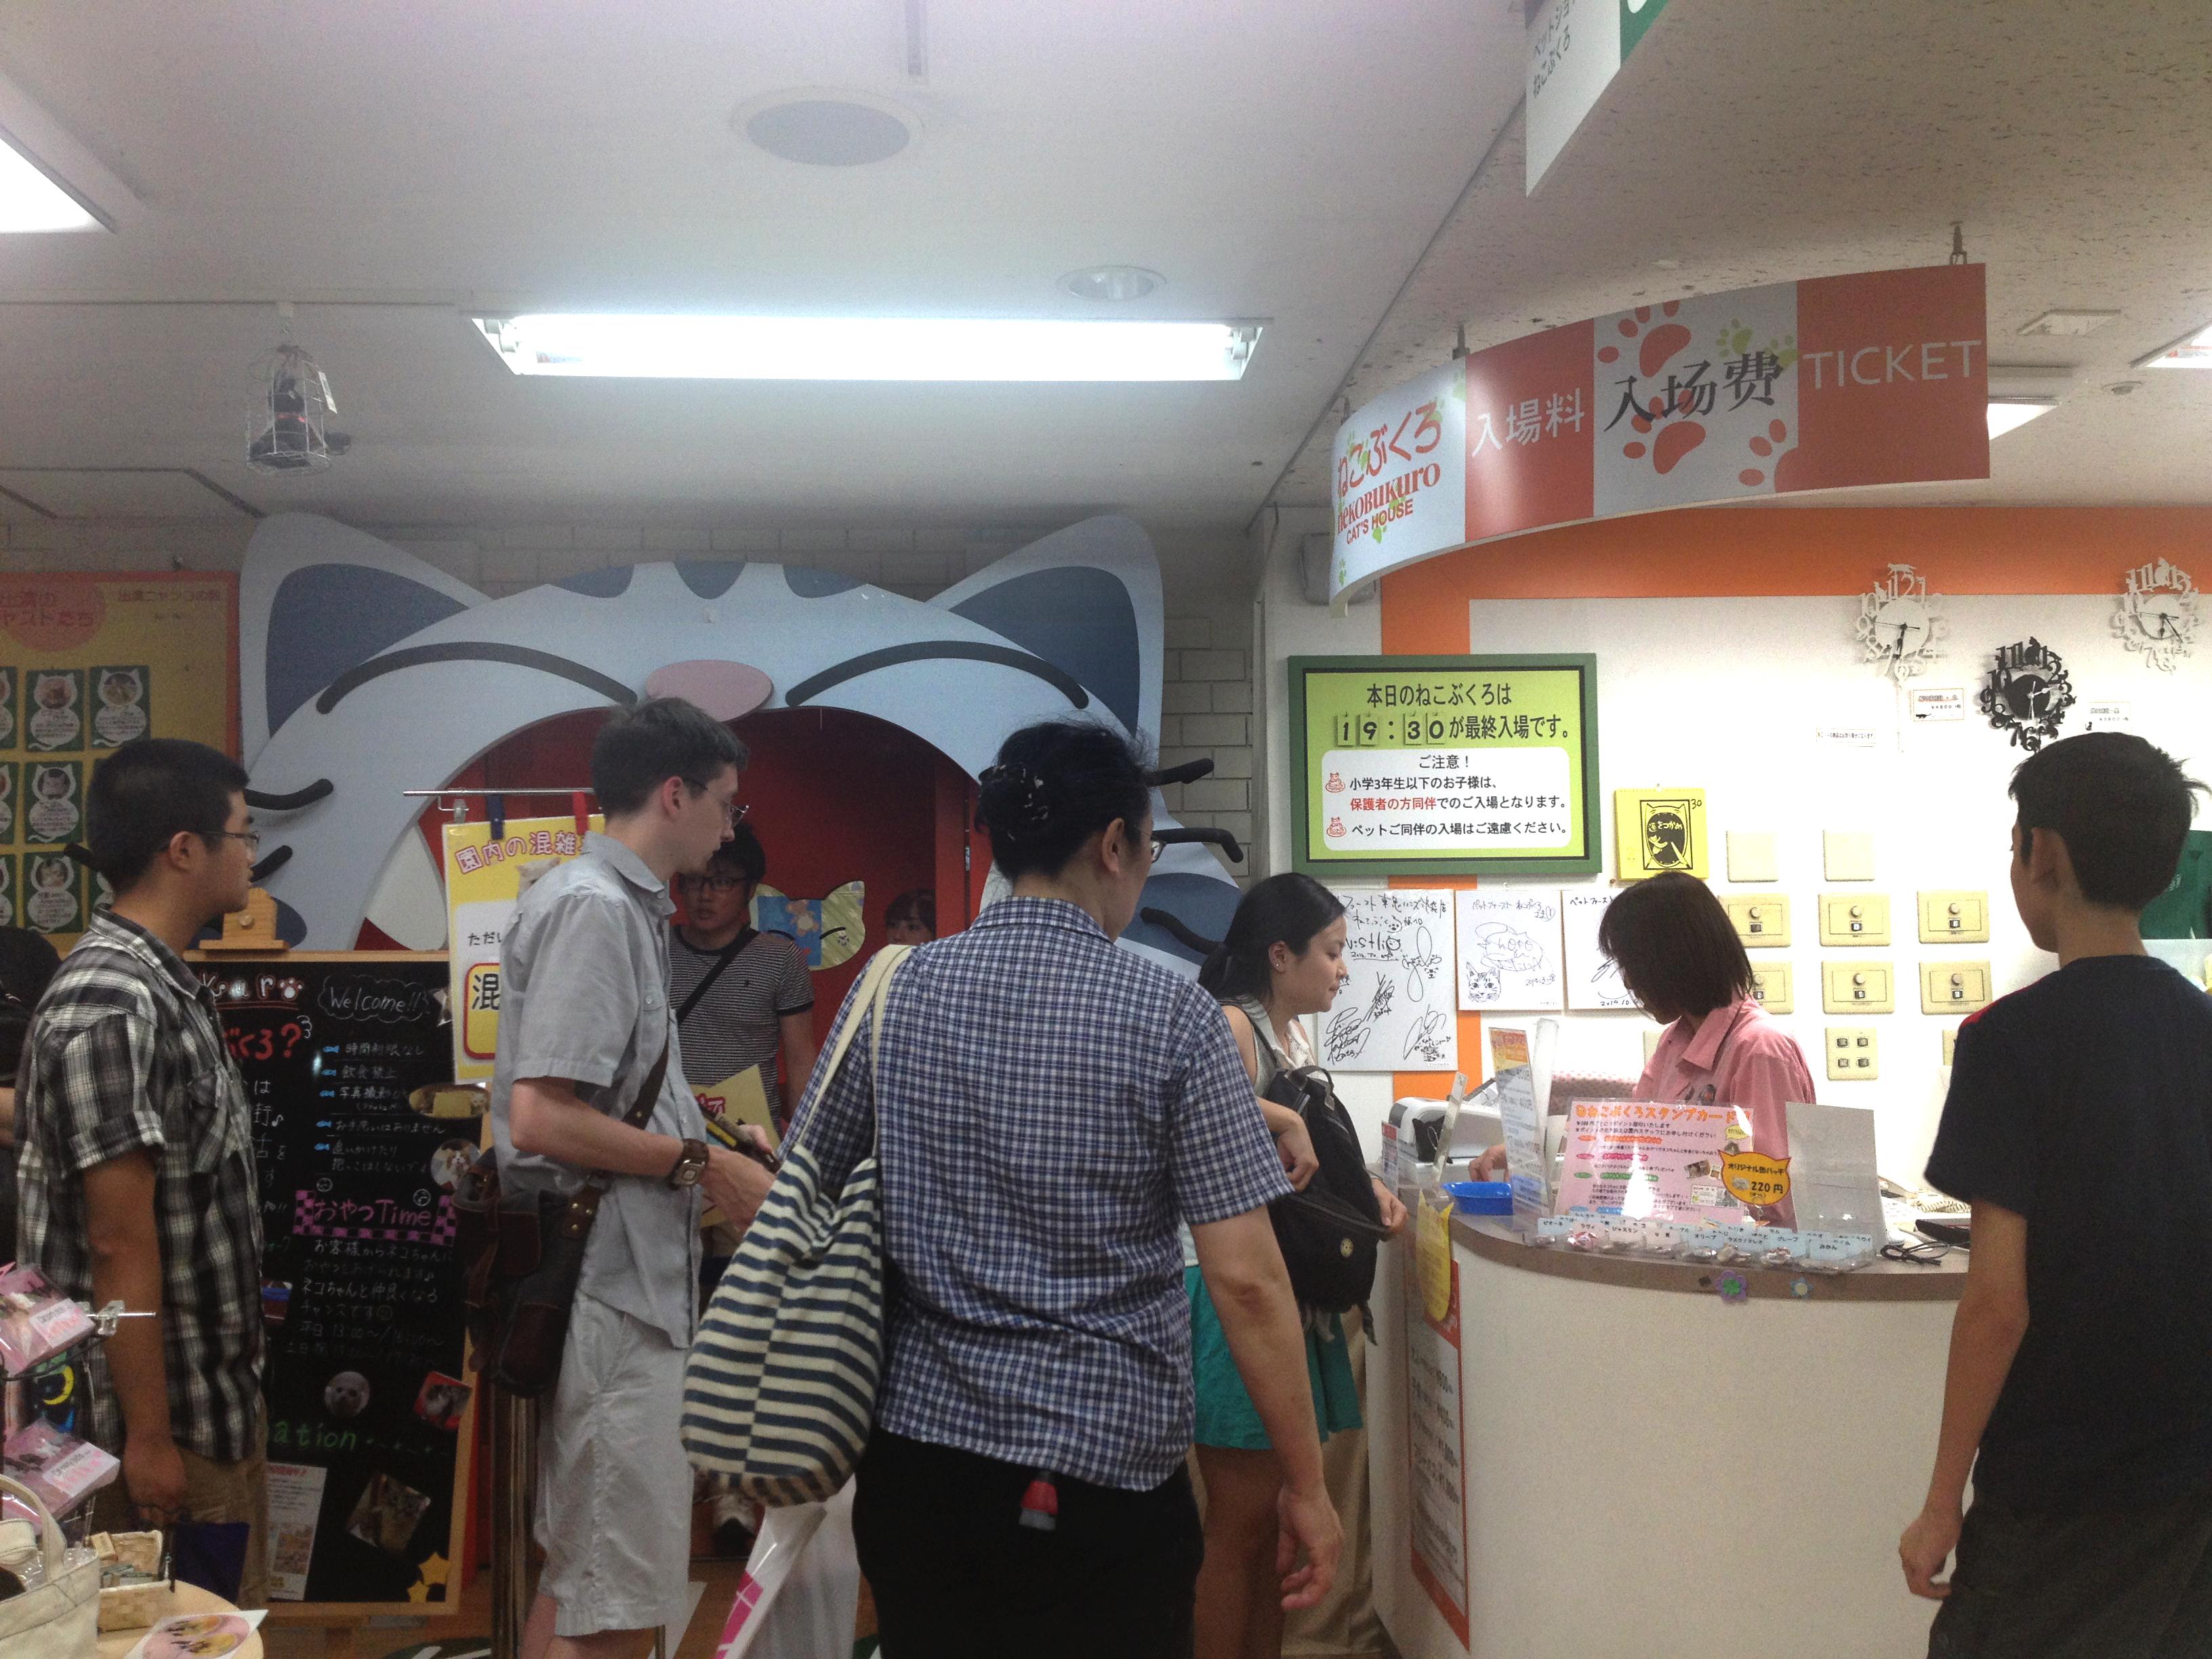 Ikebukuro: Sunshine 60 Mall, Pokemon Center, J-World, Neko